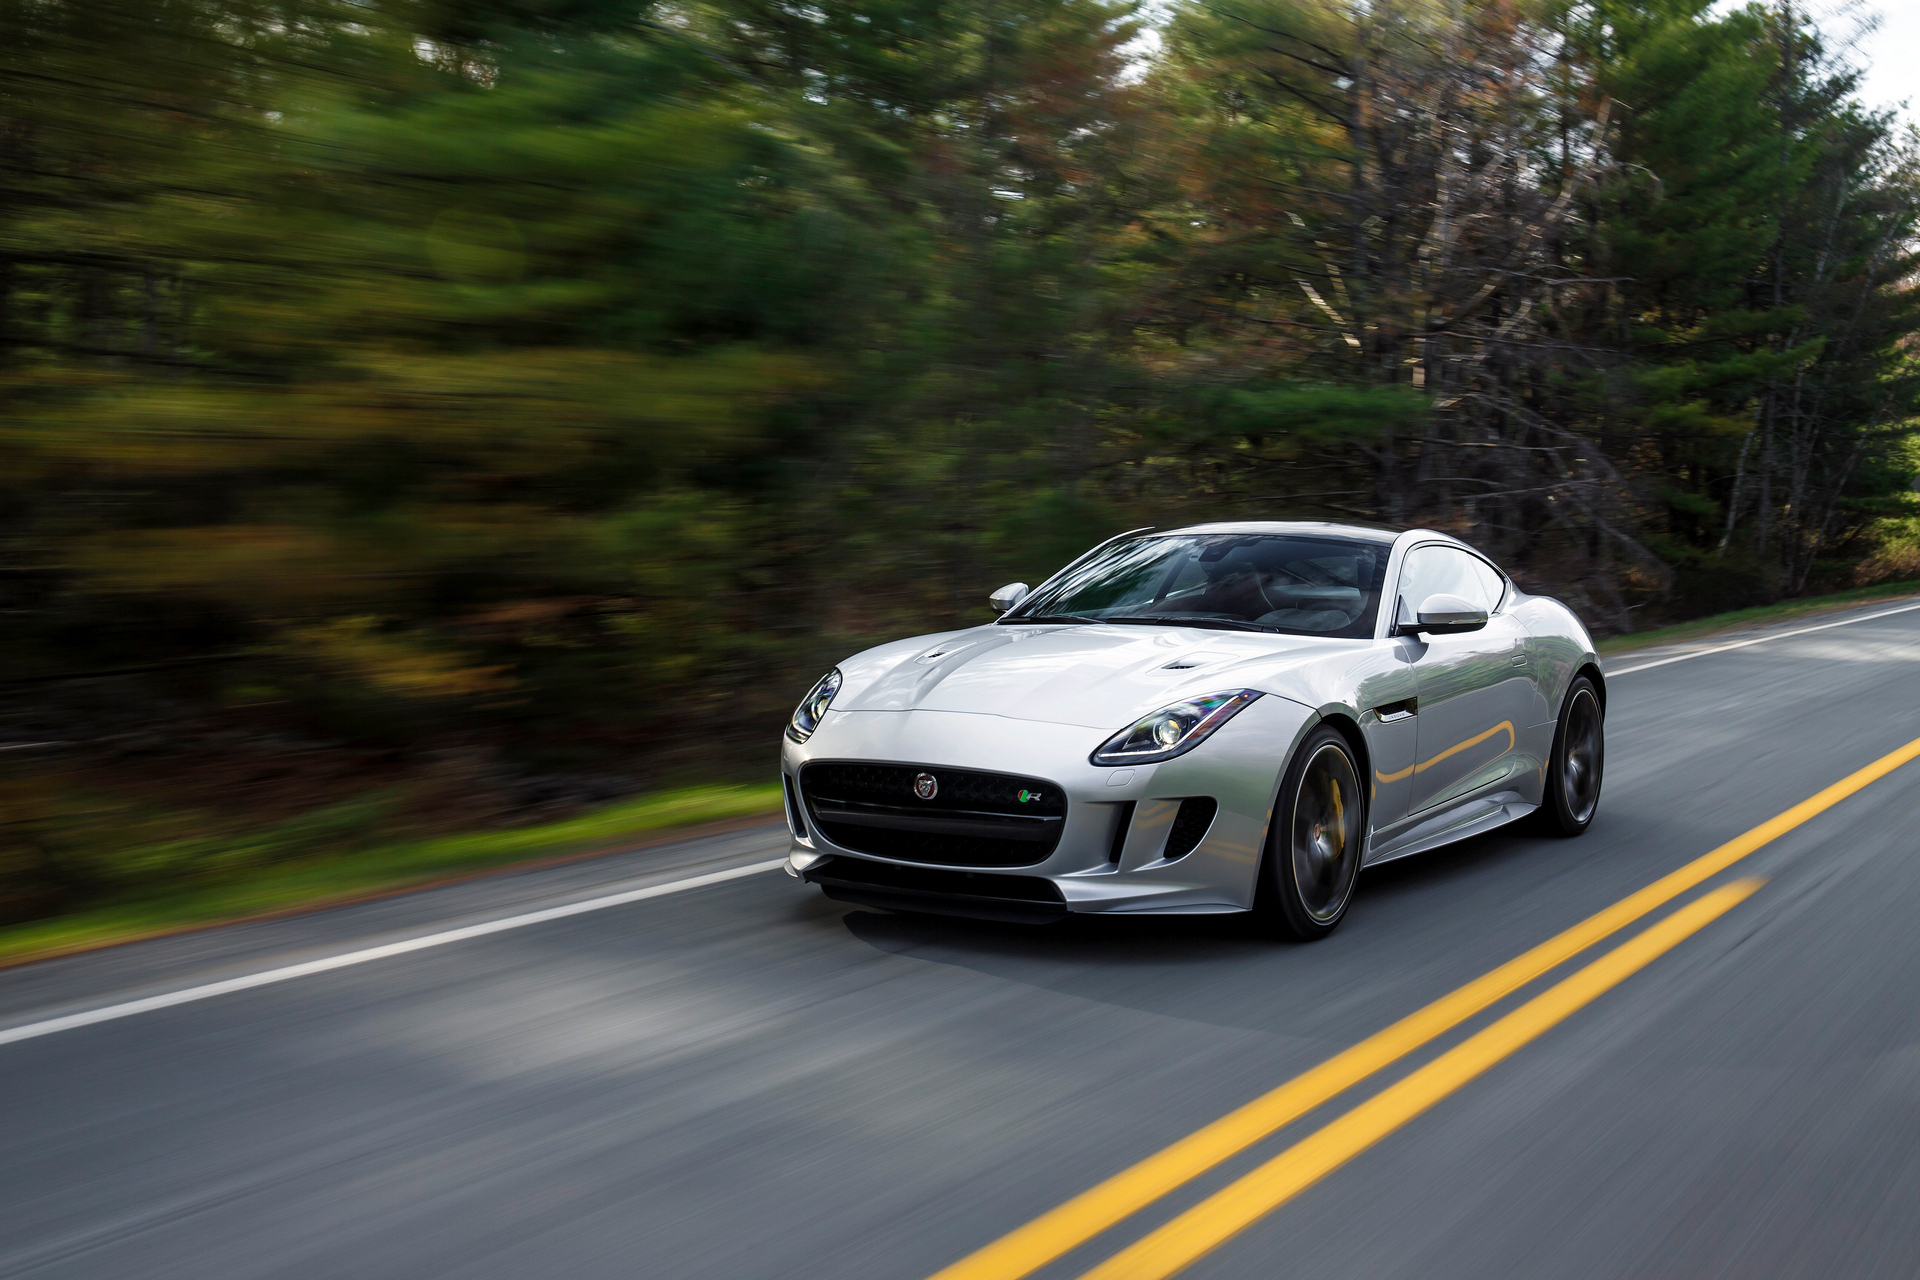 2016 Jaguar F-TYPE R © Tata Group